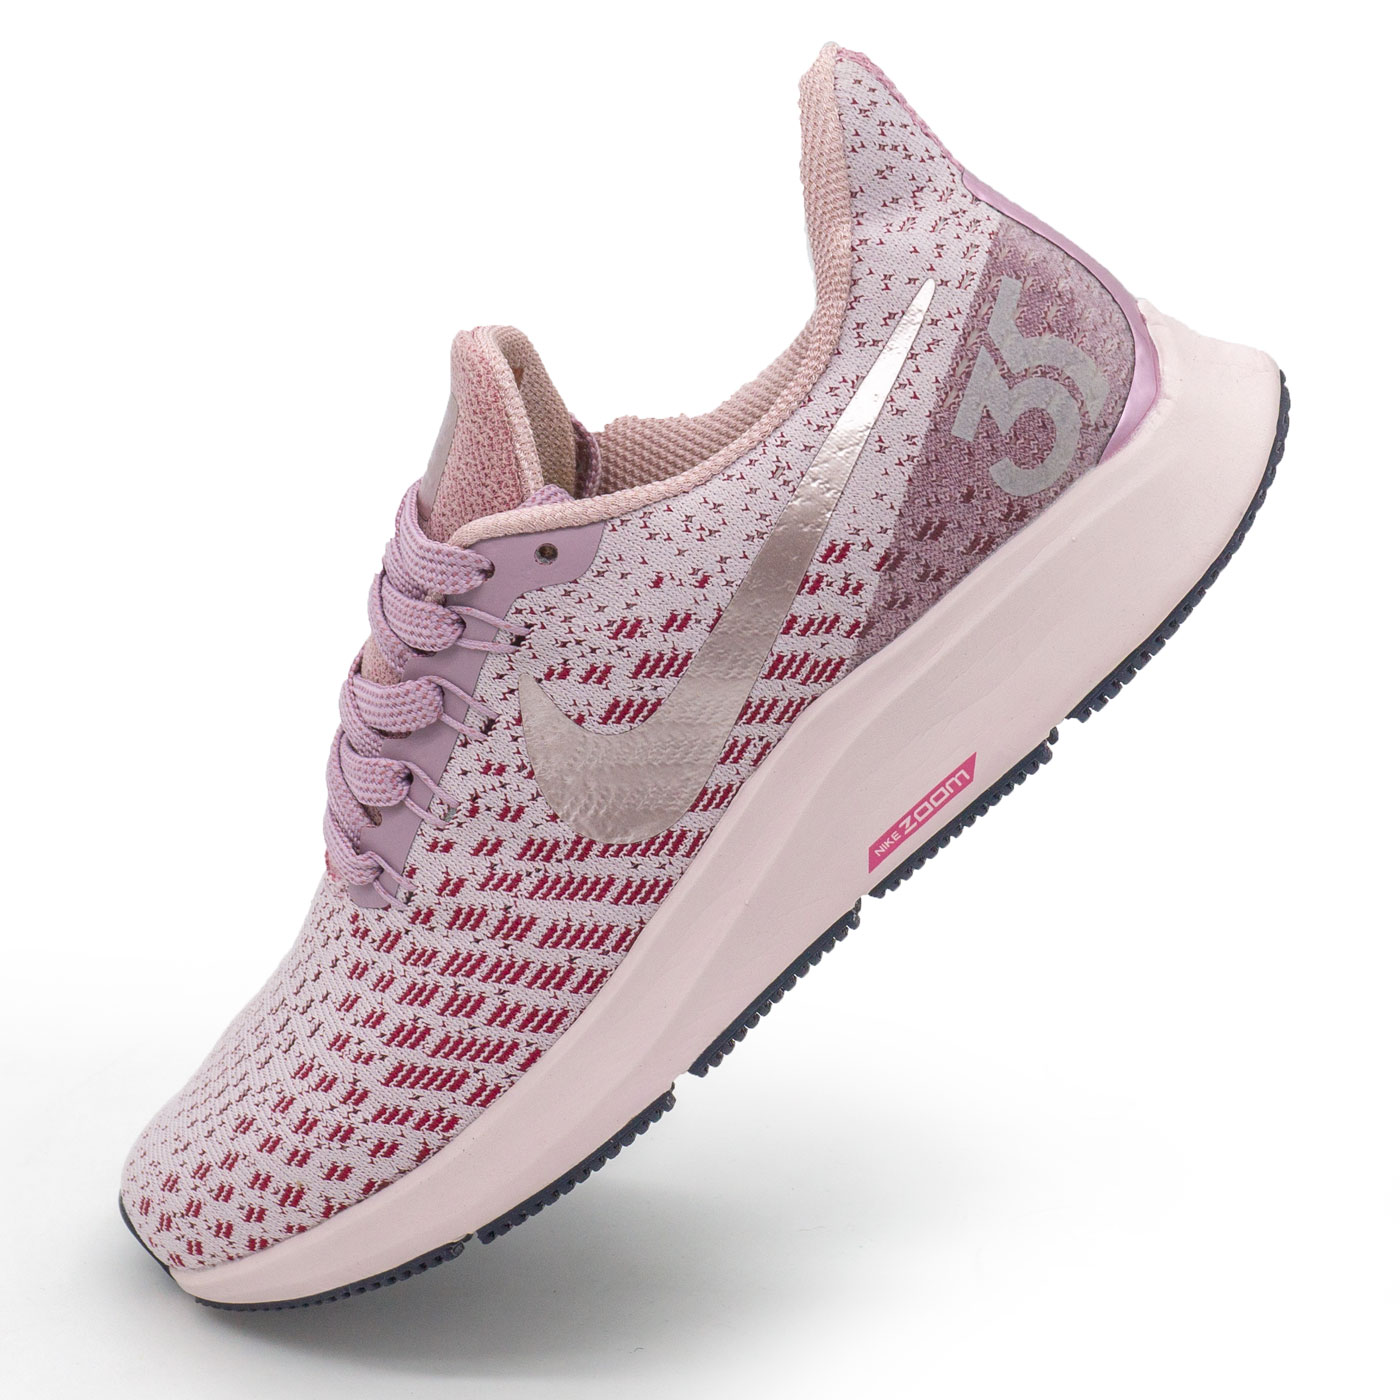 фото main Женские кроссовки для бега Nike Zoom Pegasus 35 серебро с розовым. Топ качество! main